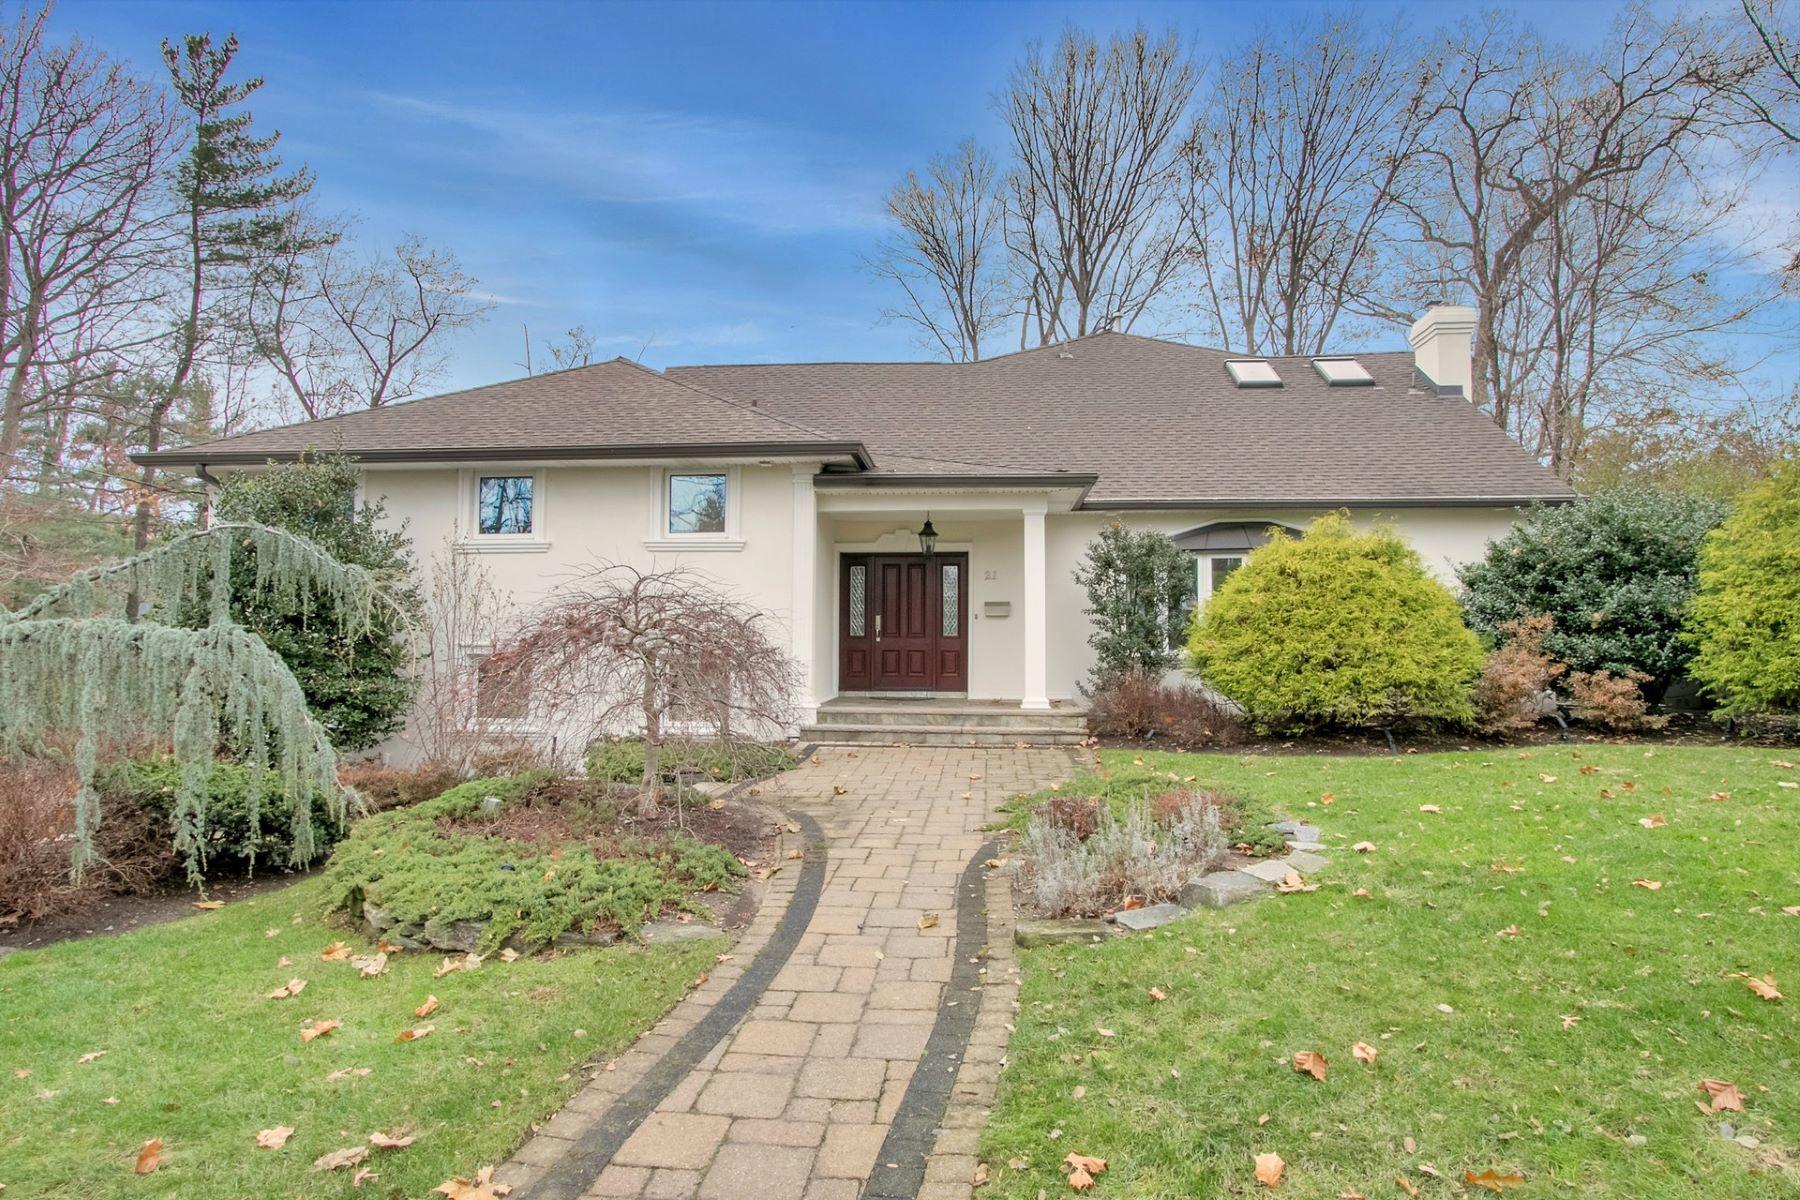 Maison unifamiliale pour l Vente à Beautifully Appointed Home 21 Kimhunter Road, Englewood Cliffs, New Jersey 07632 États-Unis